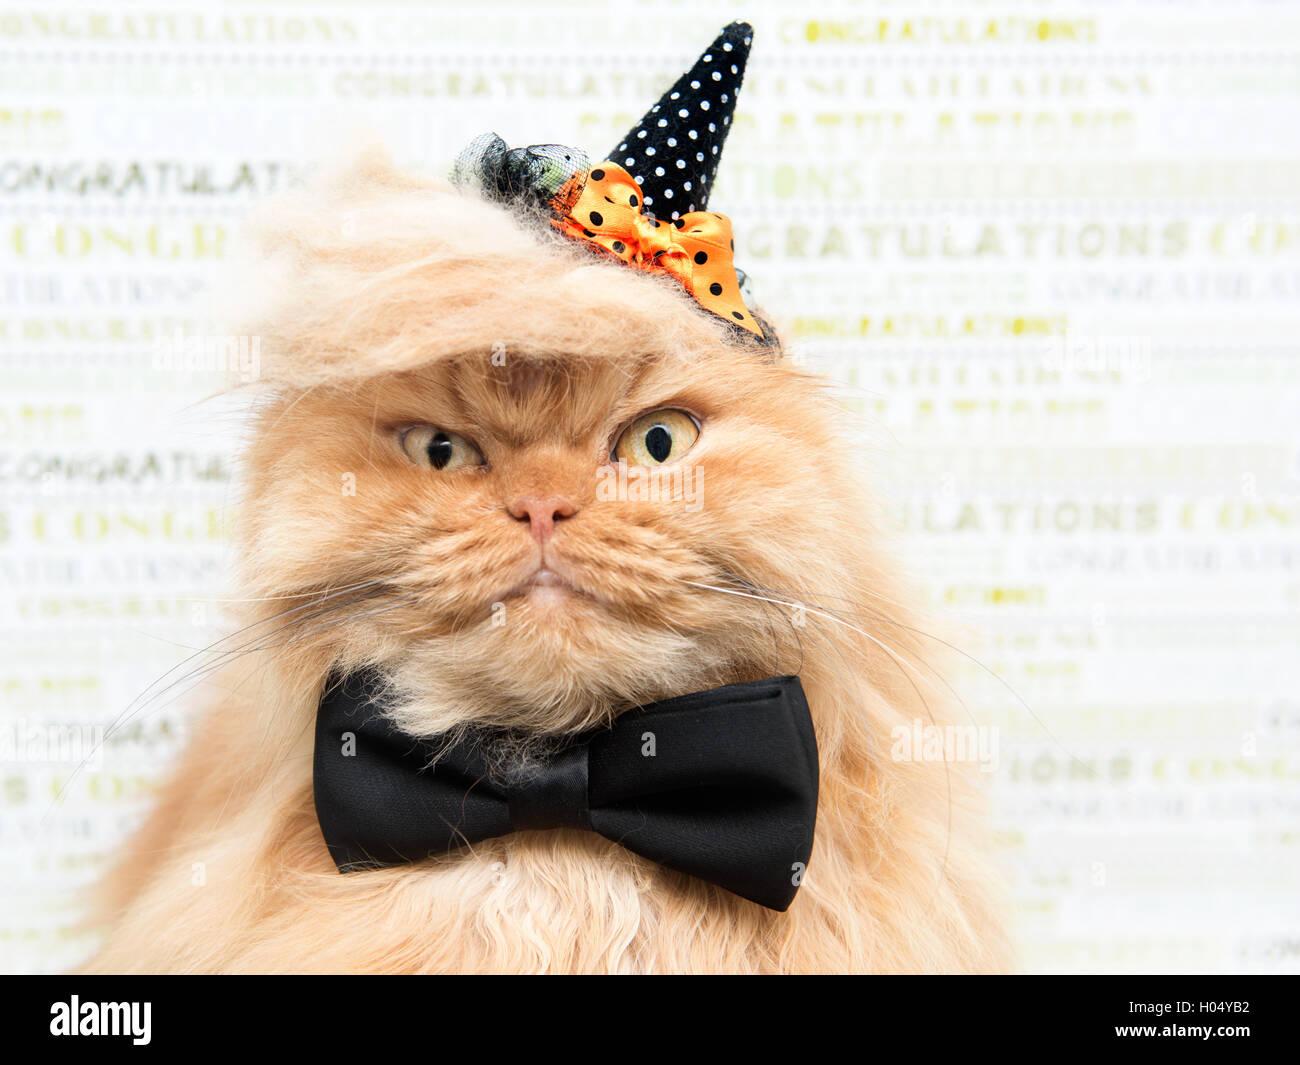 Persian cat dressing up for hallloween - Stock Image